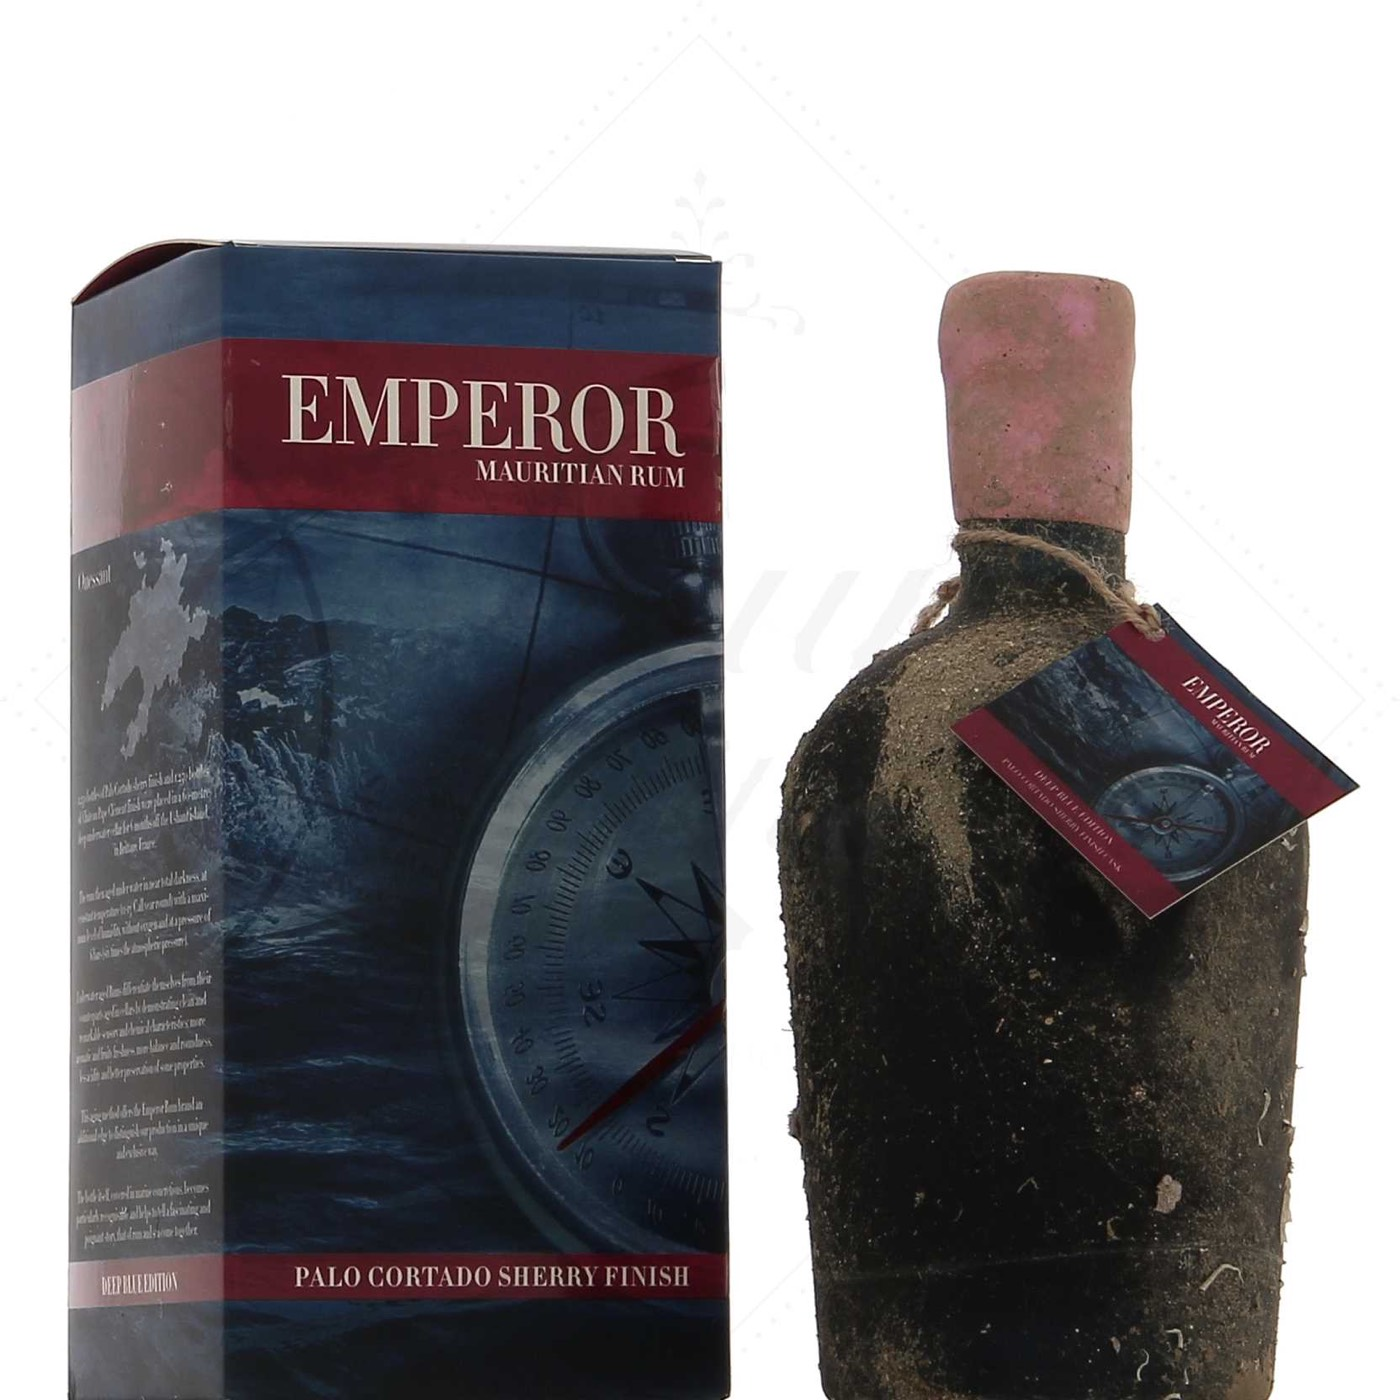 Bottle image of Deep Blue Palo Cortado Finish